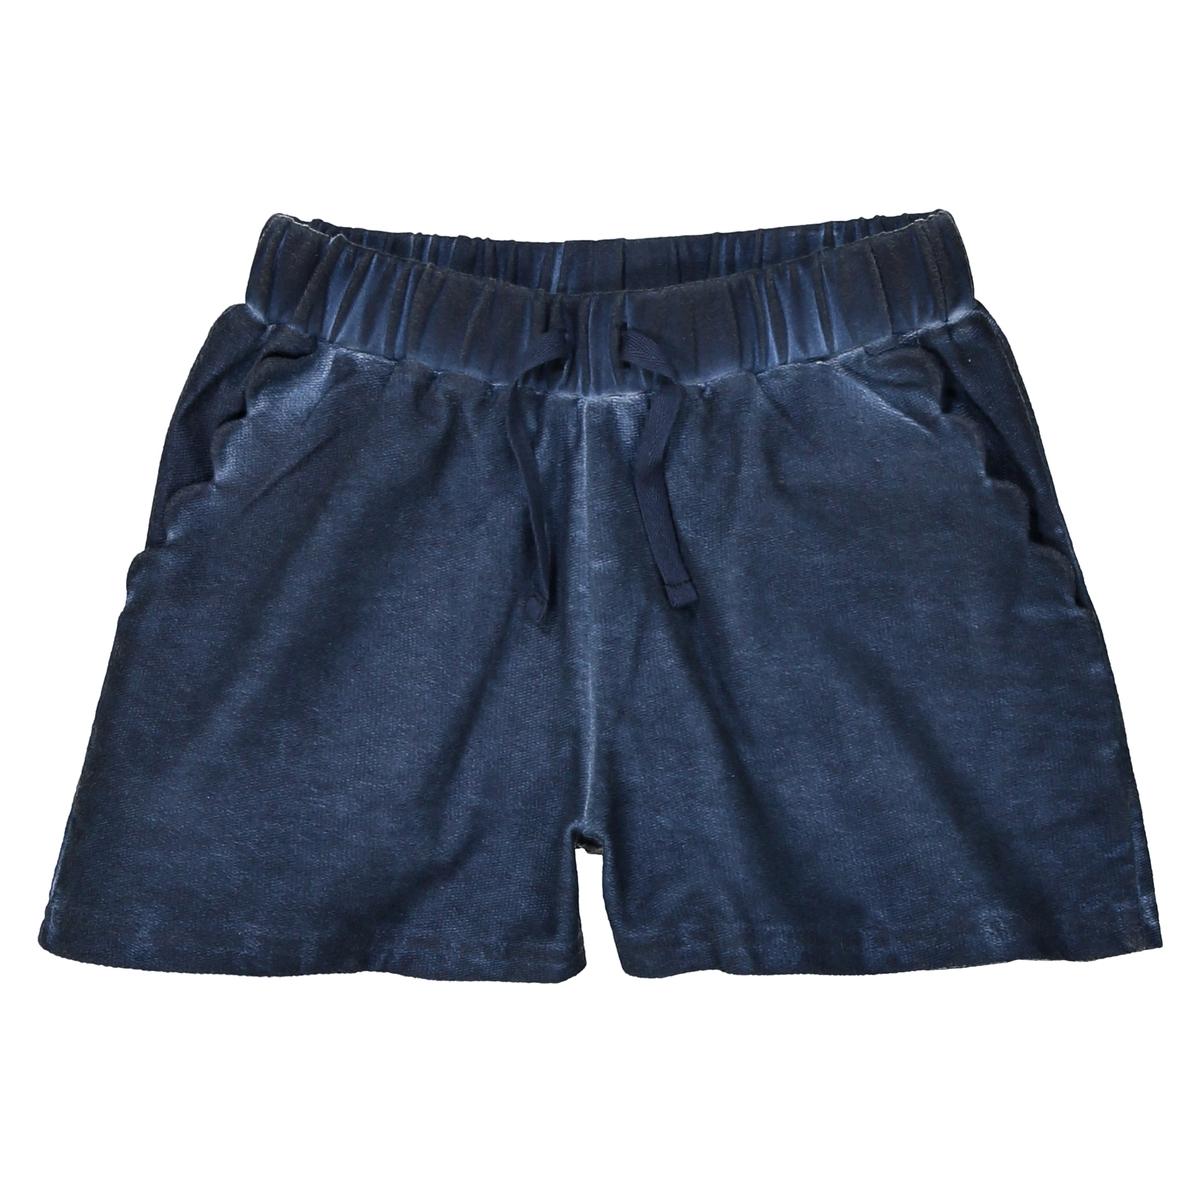 Shorts felpa 3 - 12 anni